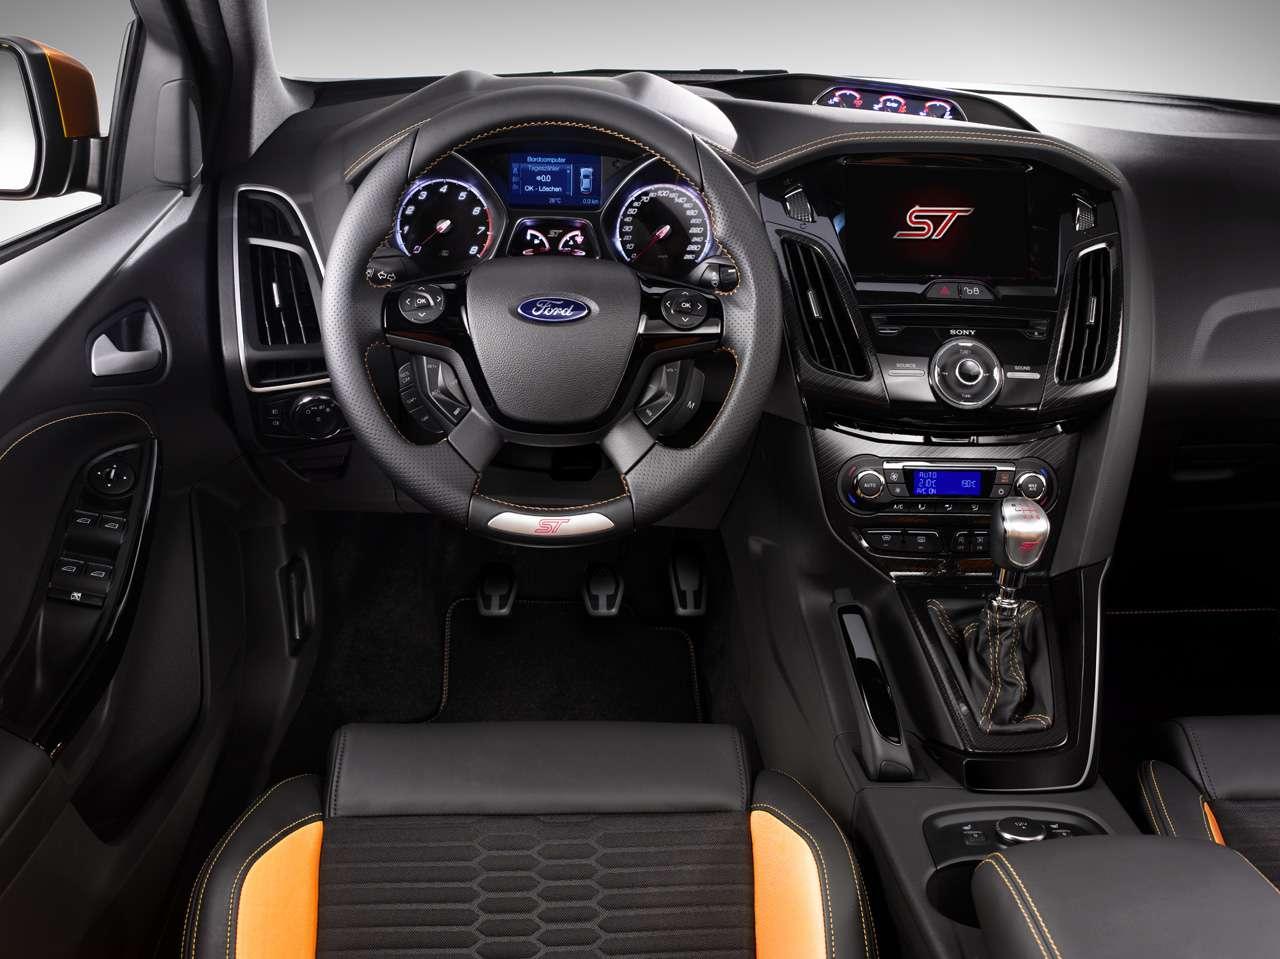 Ford Focus ST 2012 paryz 2010 wrzesien 2010